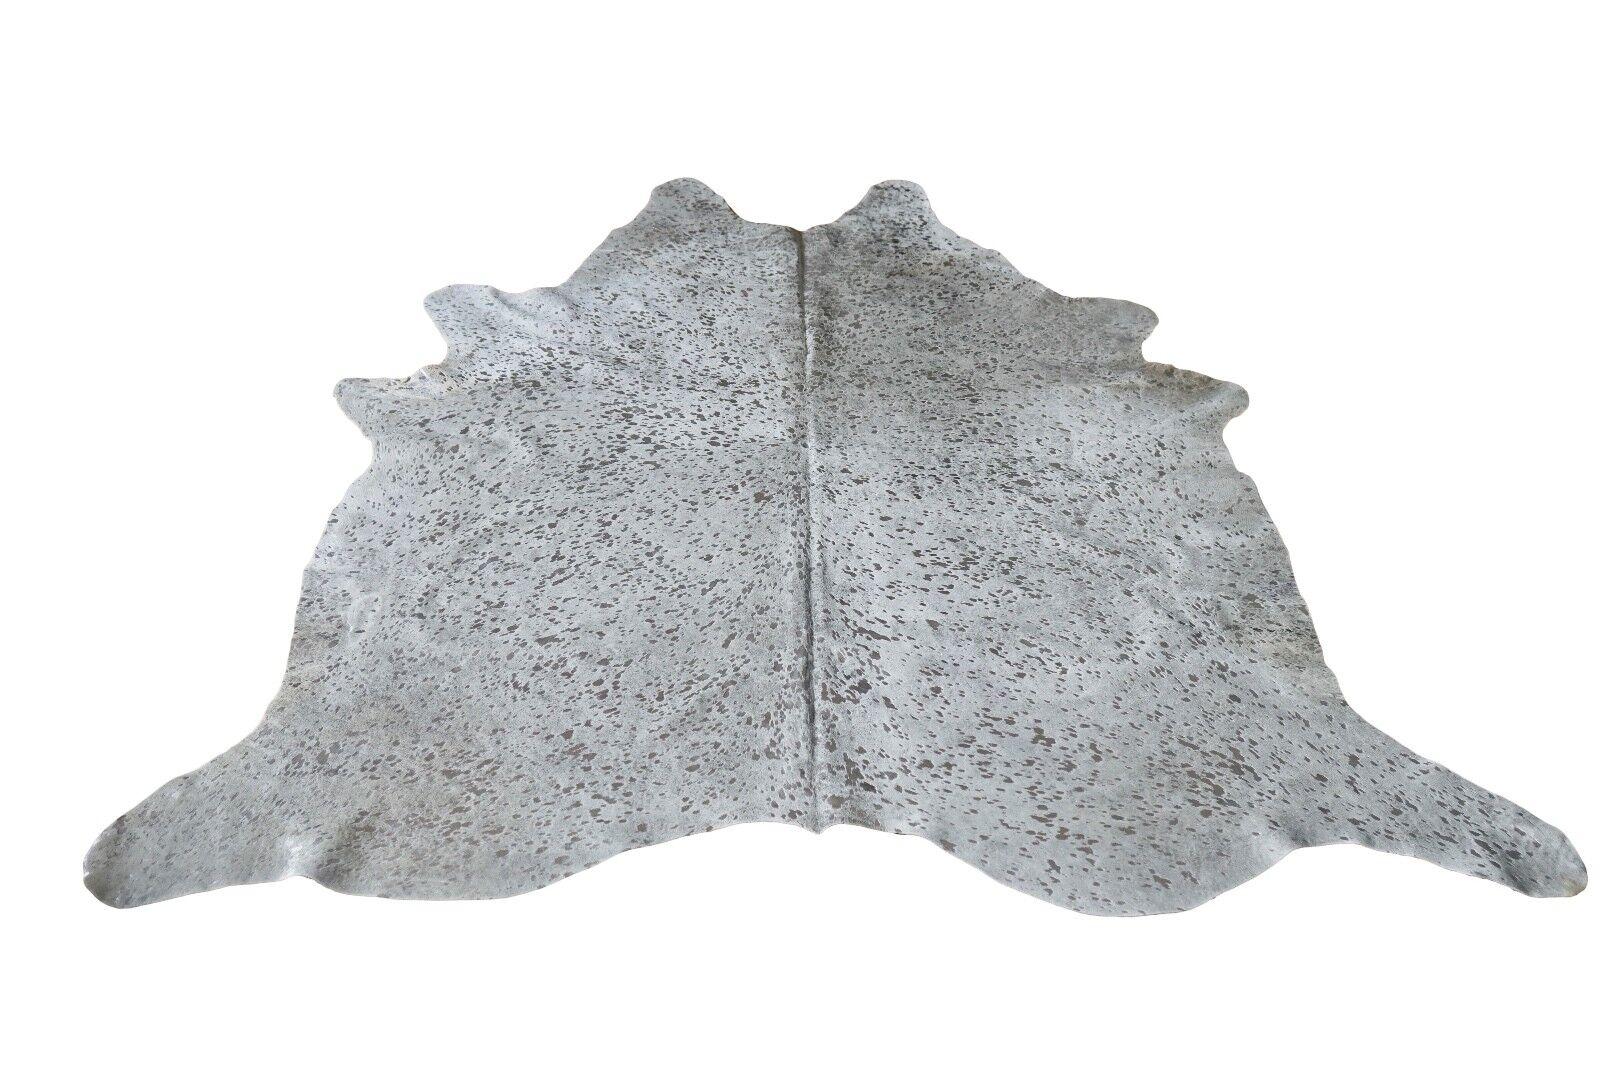 Peau 196 rinderfell Metallic gris clair argent-environ 227 cm X 196 Peau cm, Rug, Neuf 99b2a2